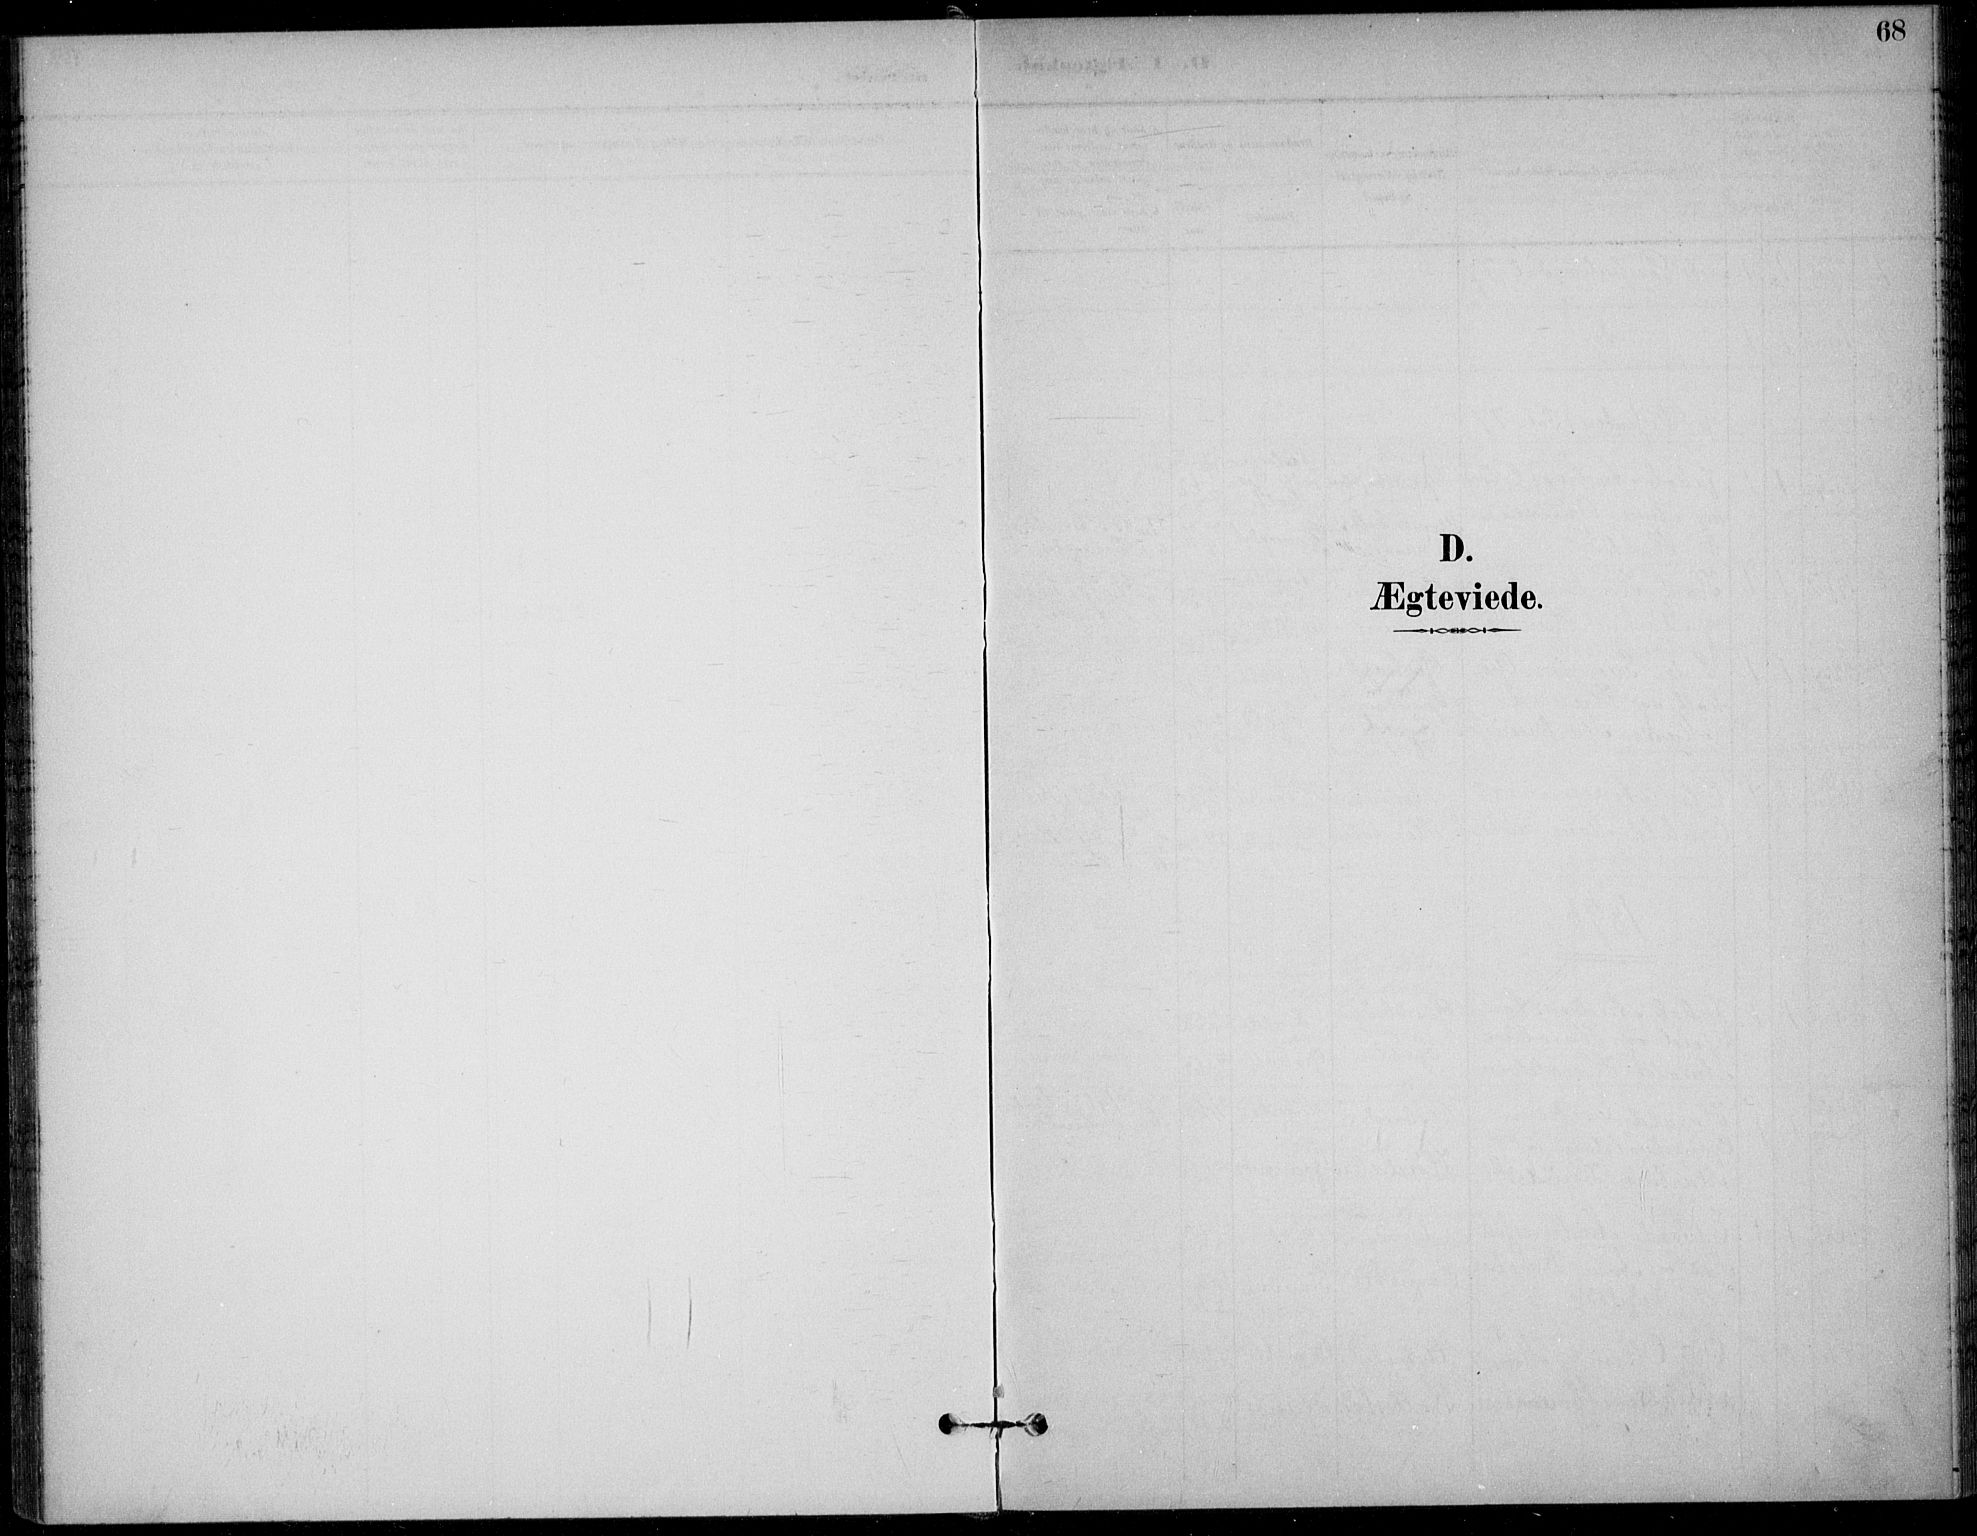 SAKO, Solum kirkebøker, F/Fc/L0002: Ministerialbok nr. III 2, 1892-1906, s. 68